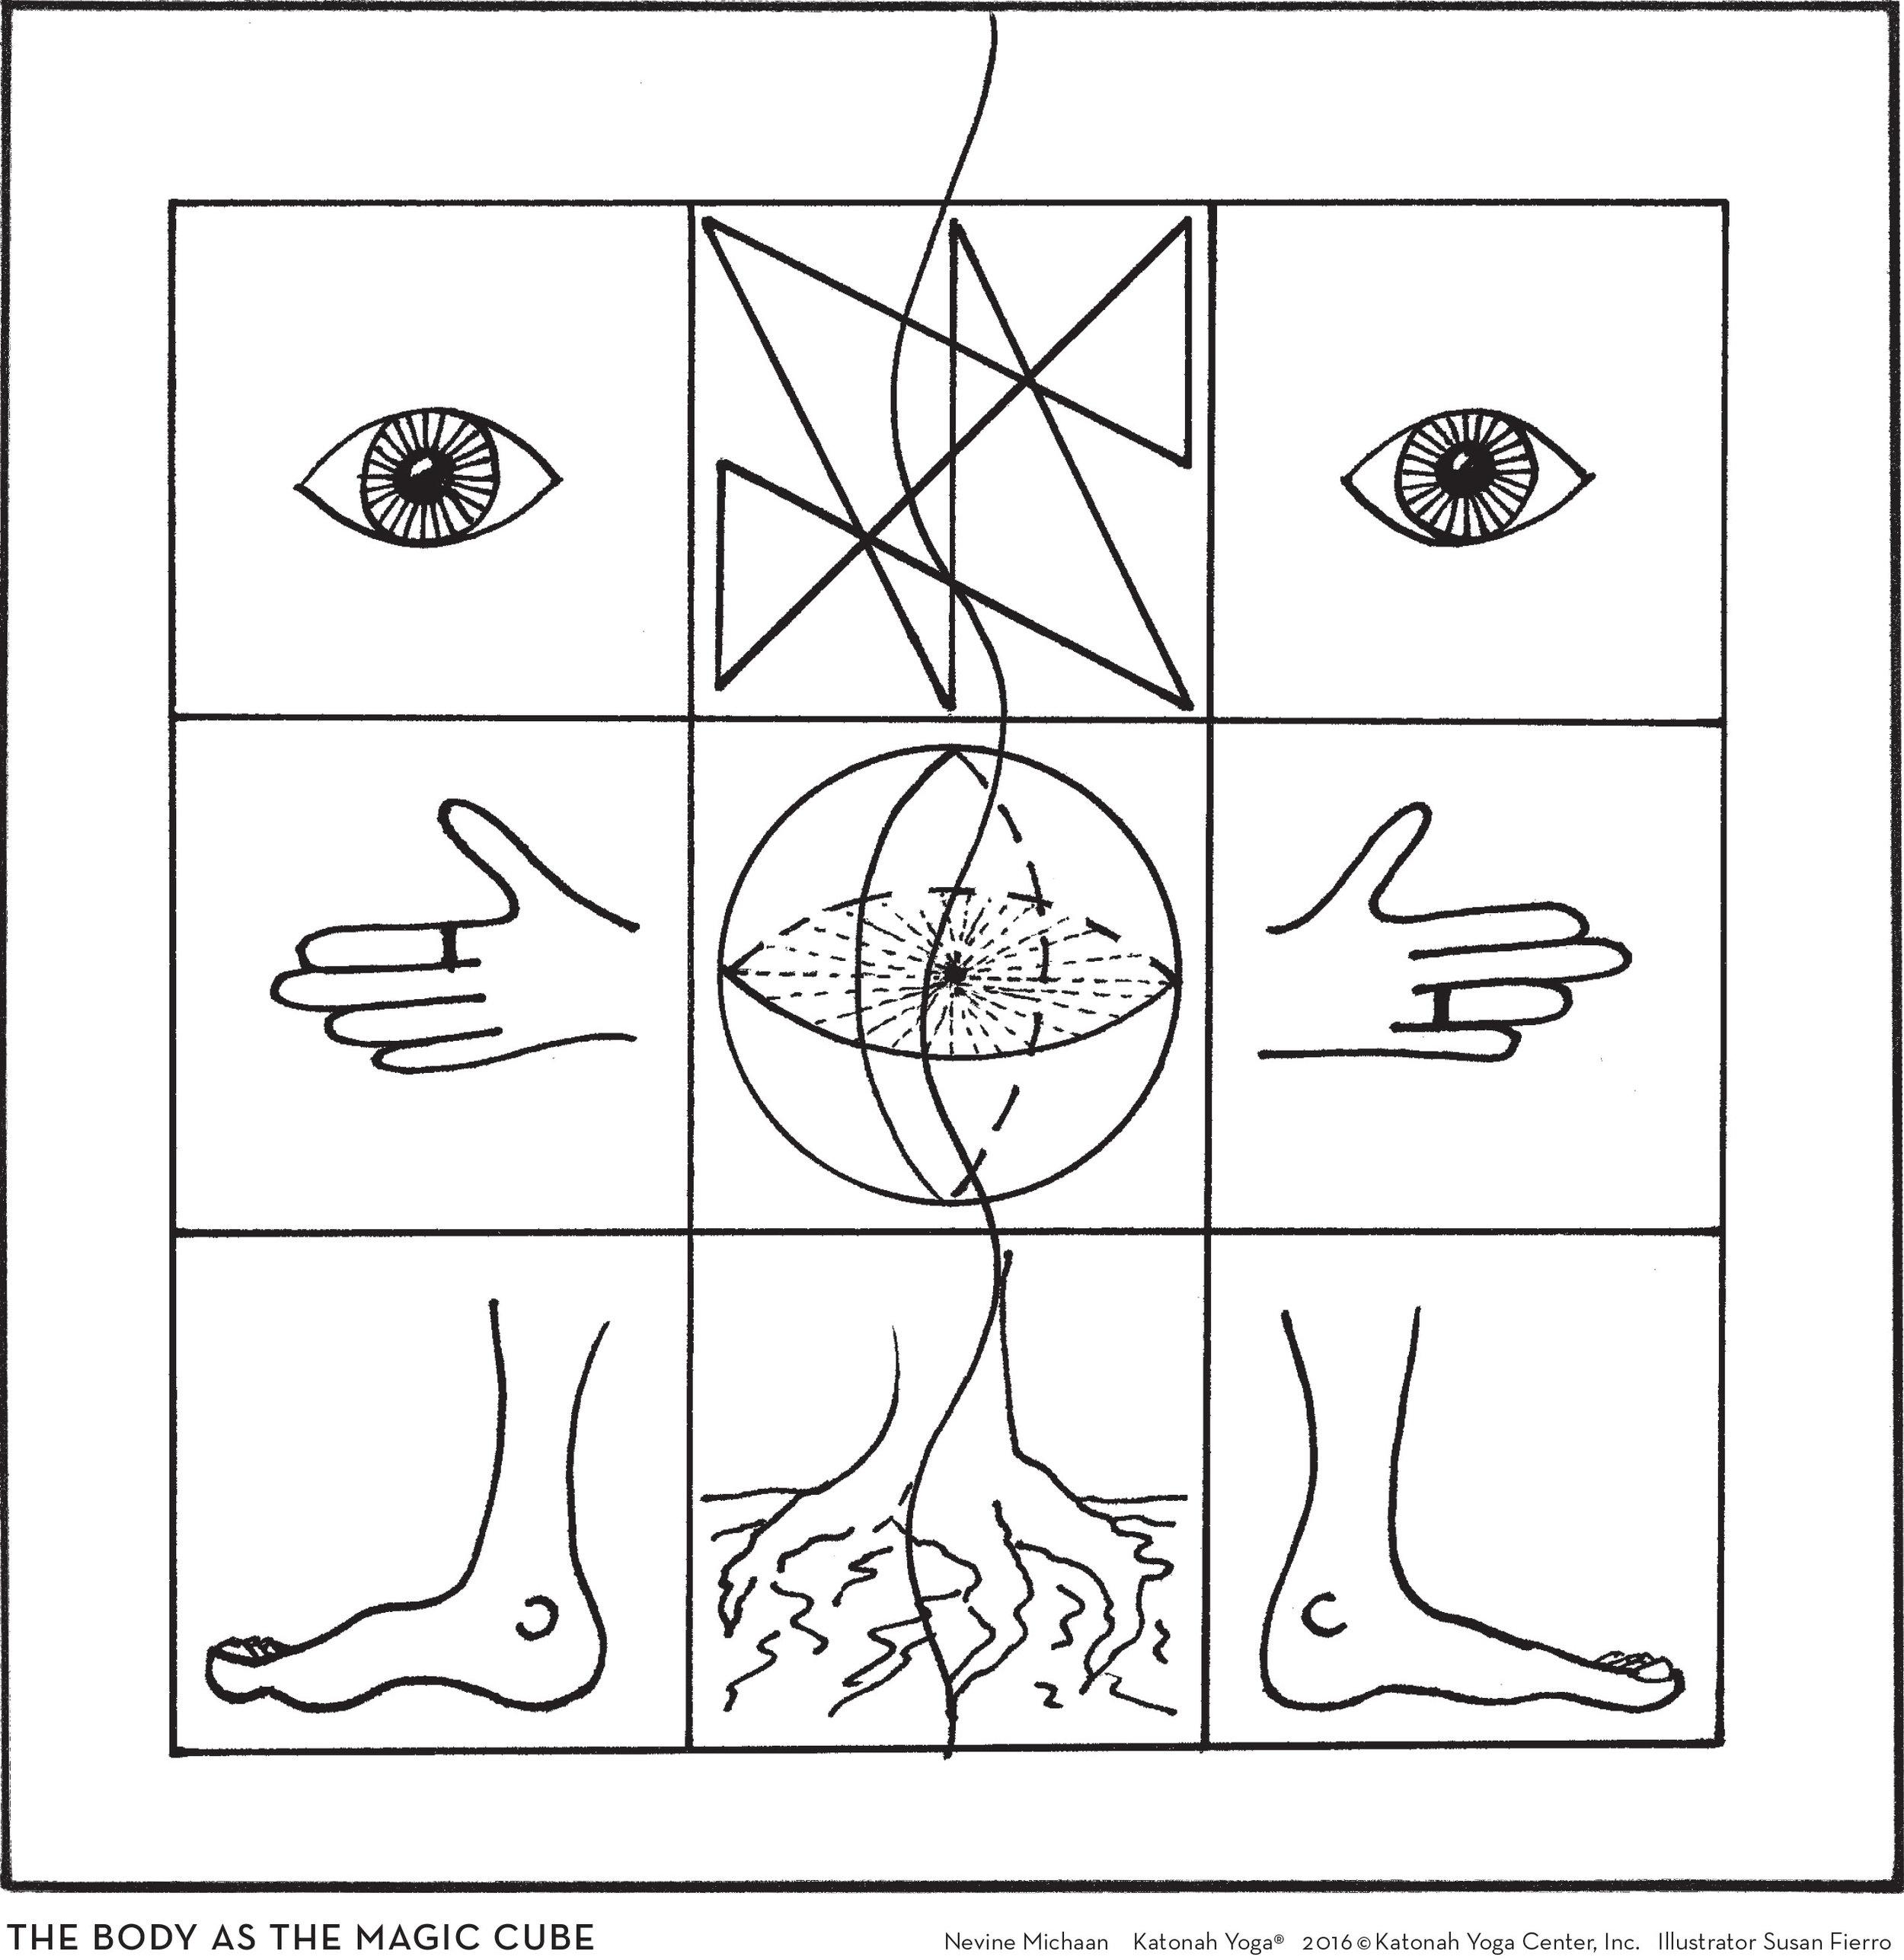 The Body as Magic Cube